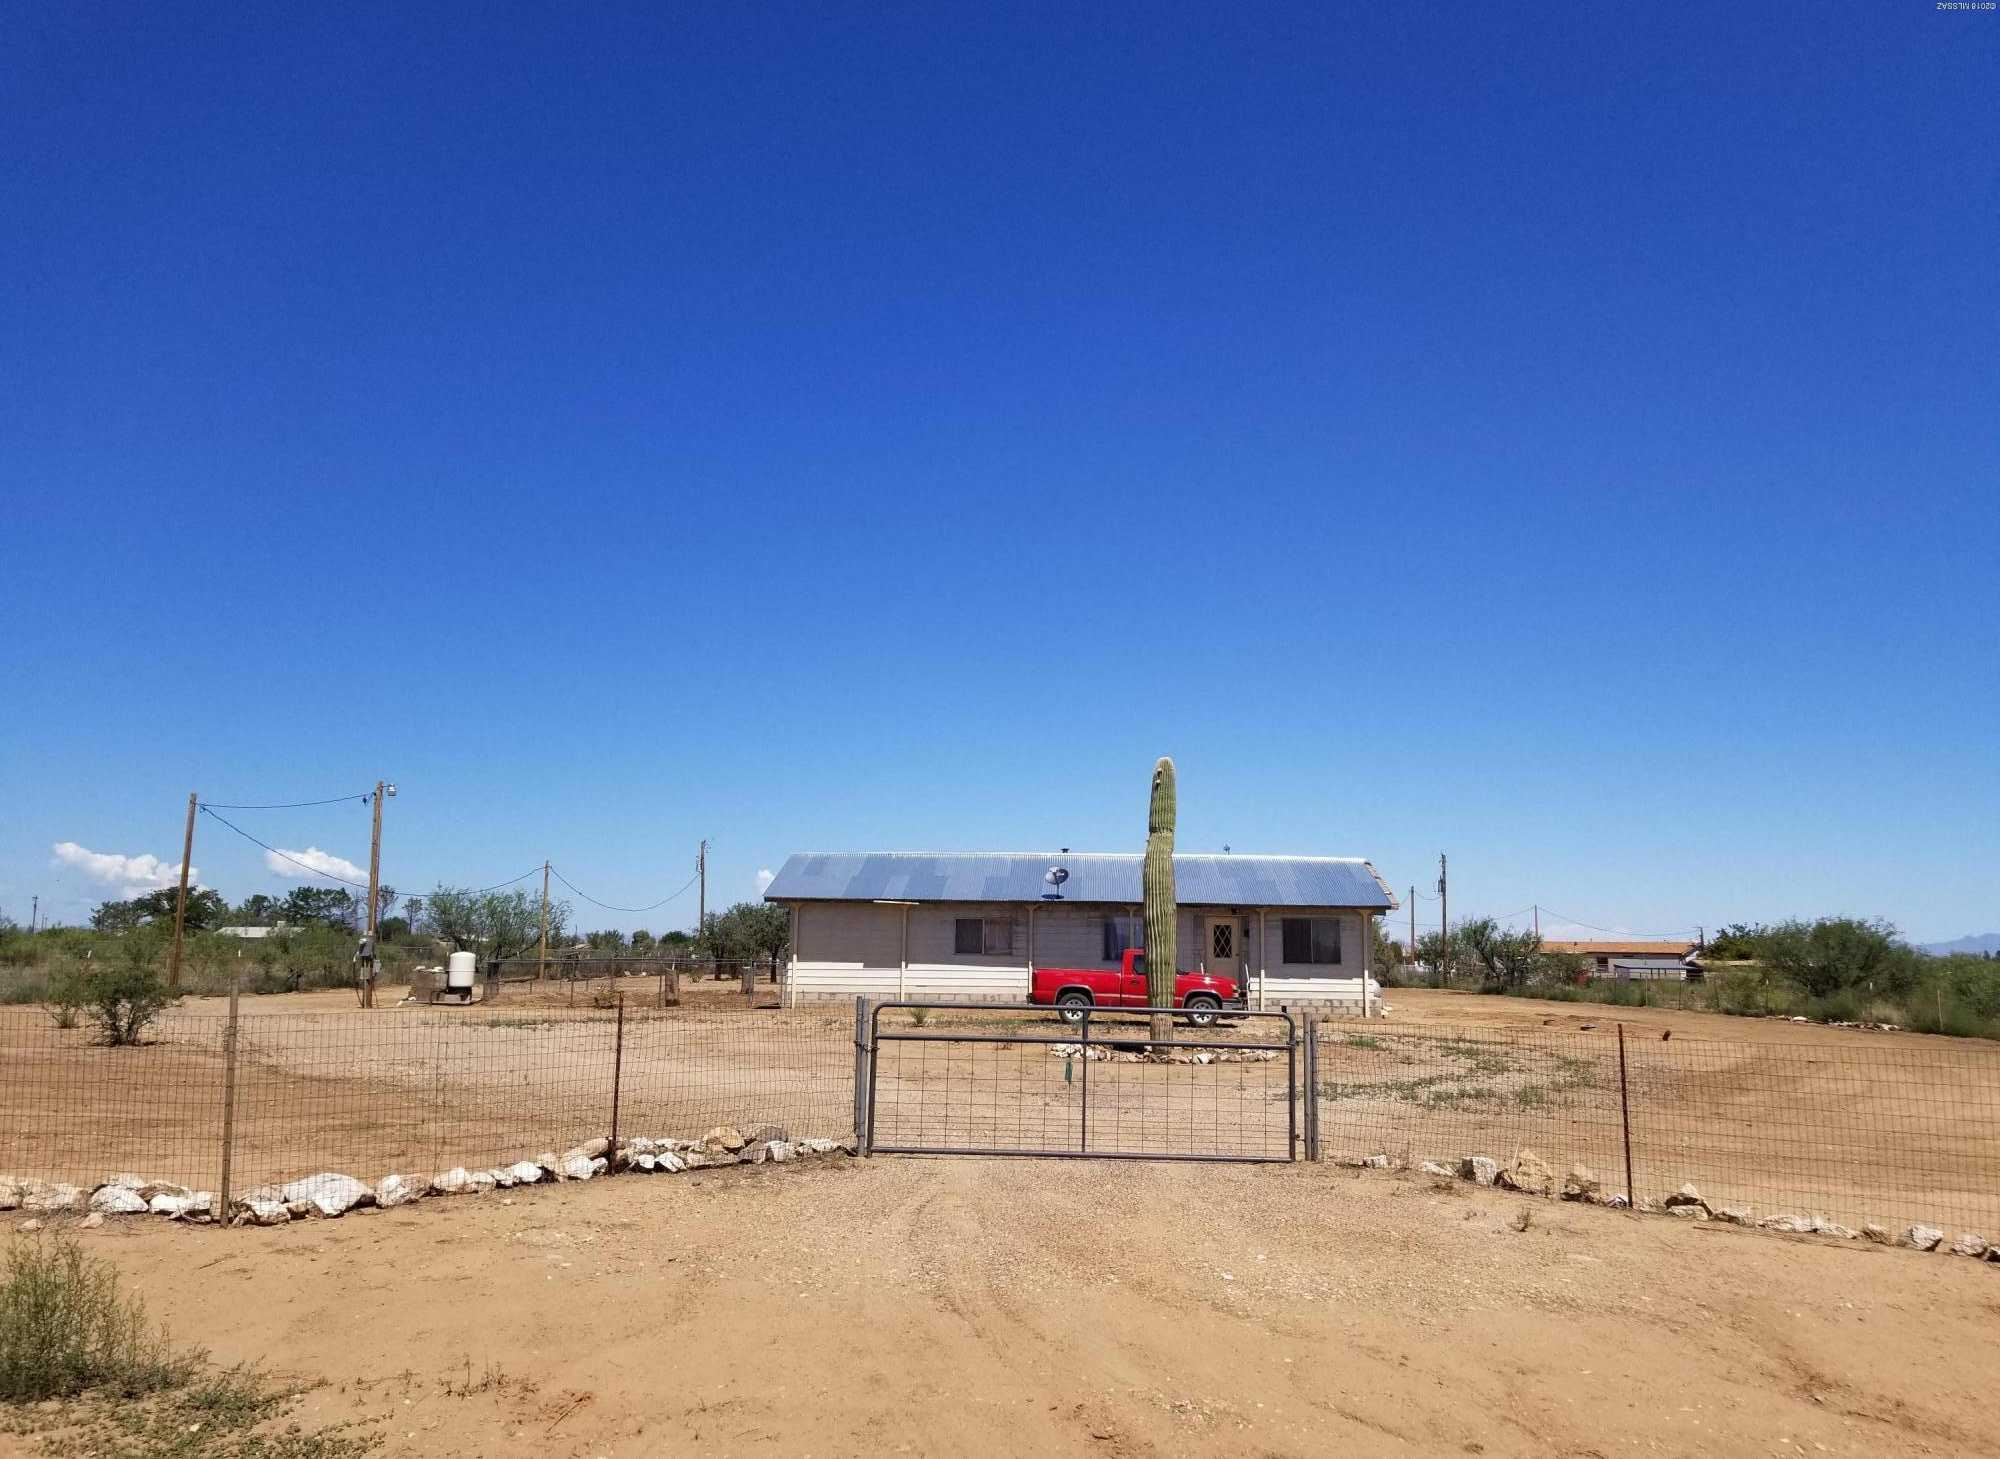 MLS# 21825269 - 91 E Cochise Way, Cochise, AZ 85606